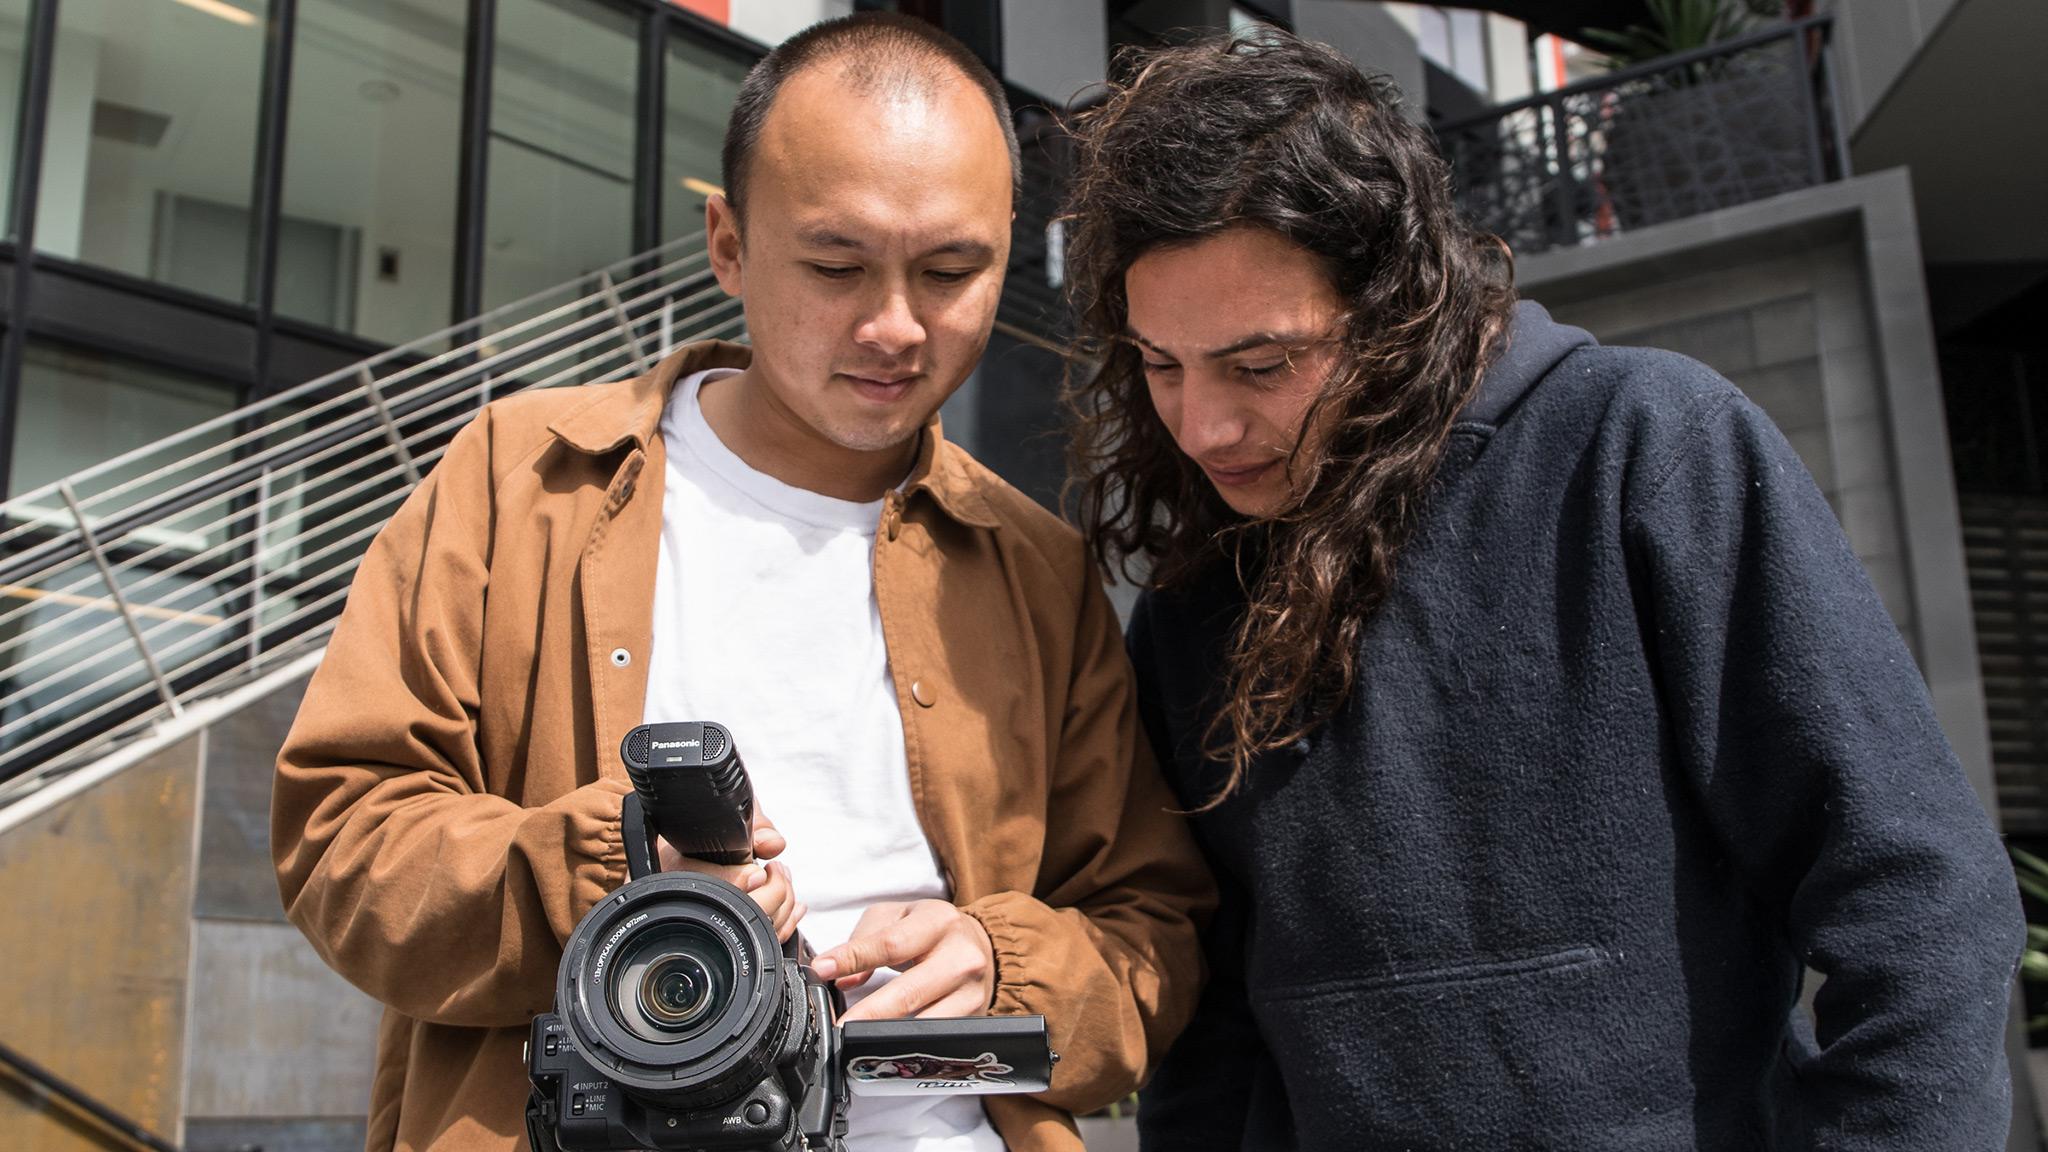 Wilson's Filmer: Don Luong